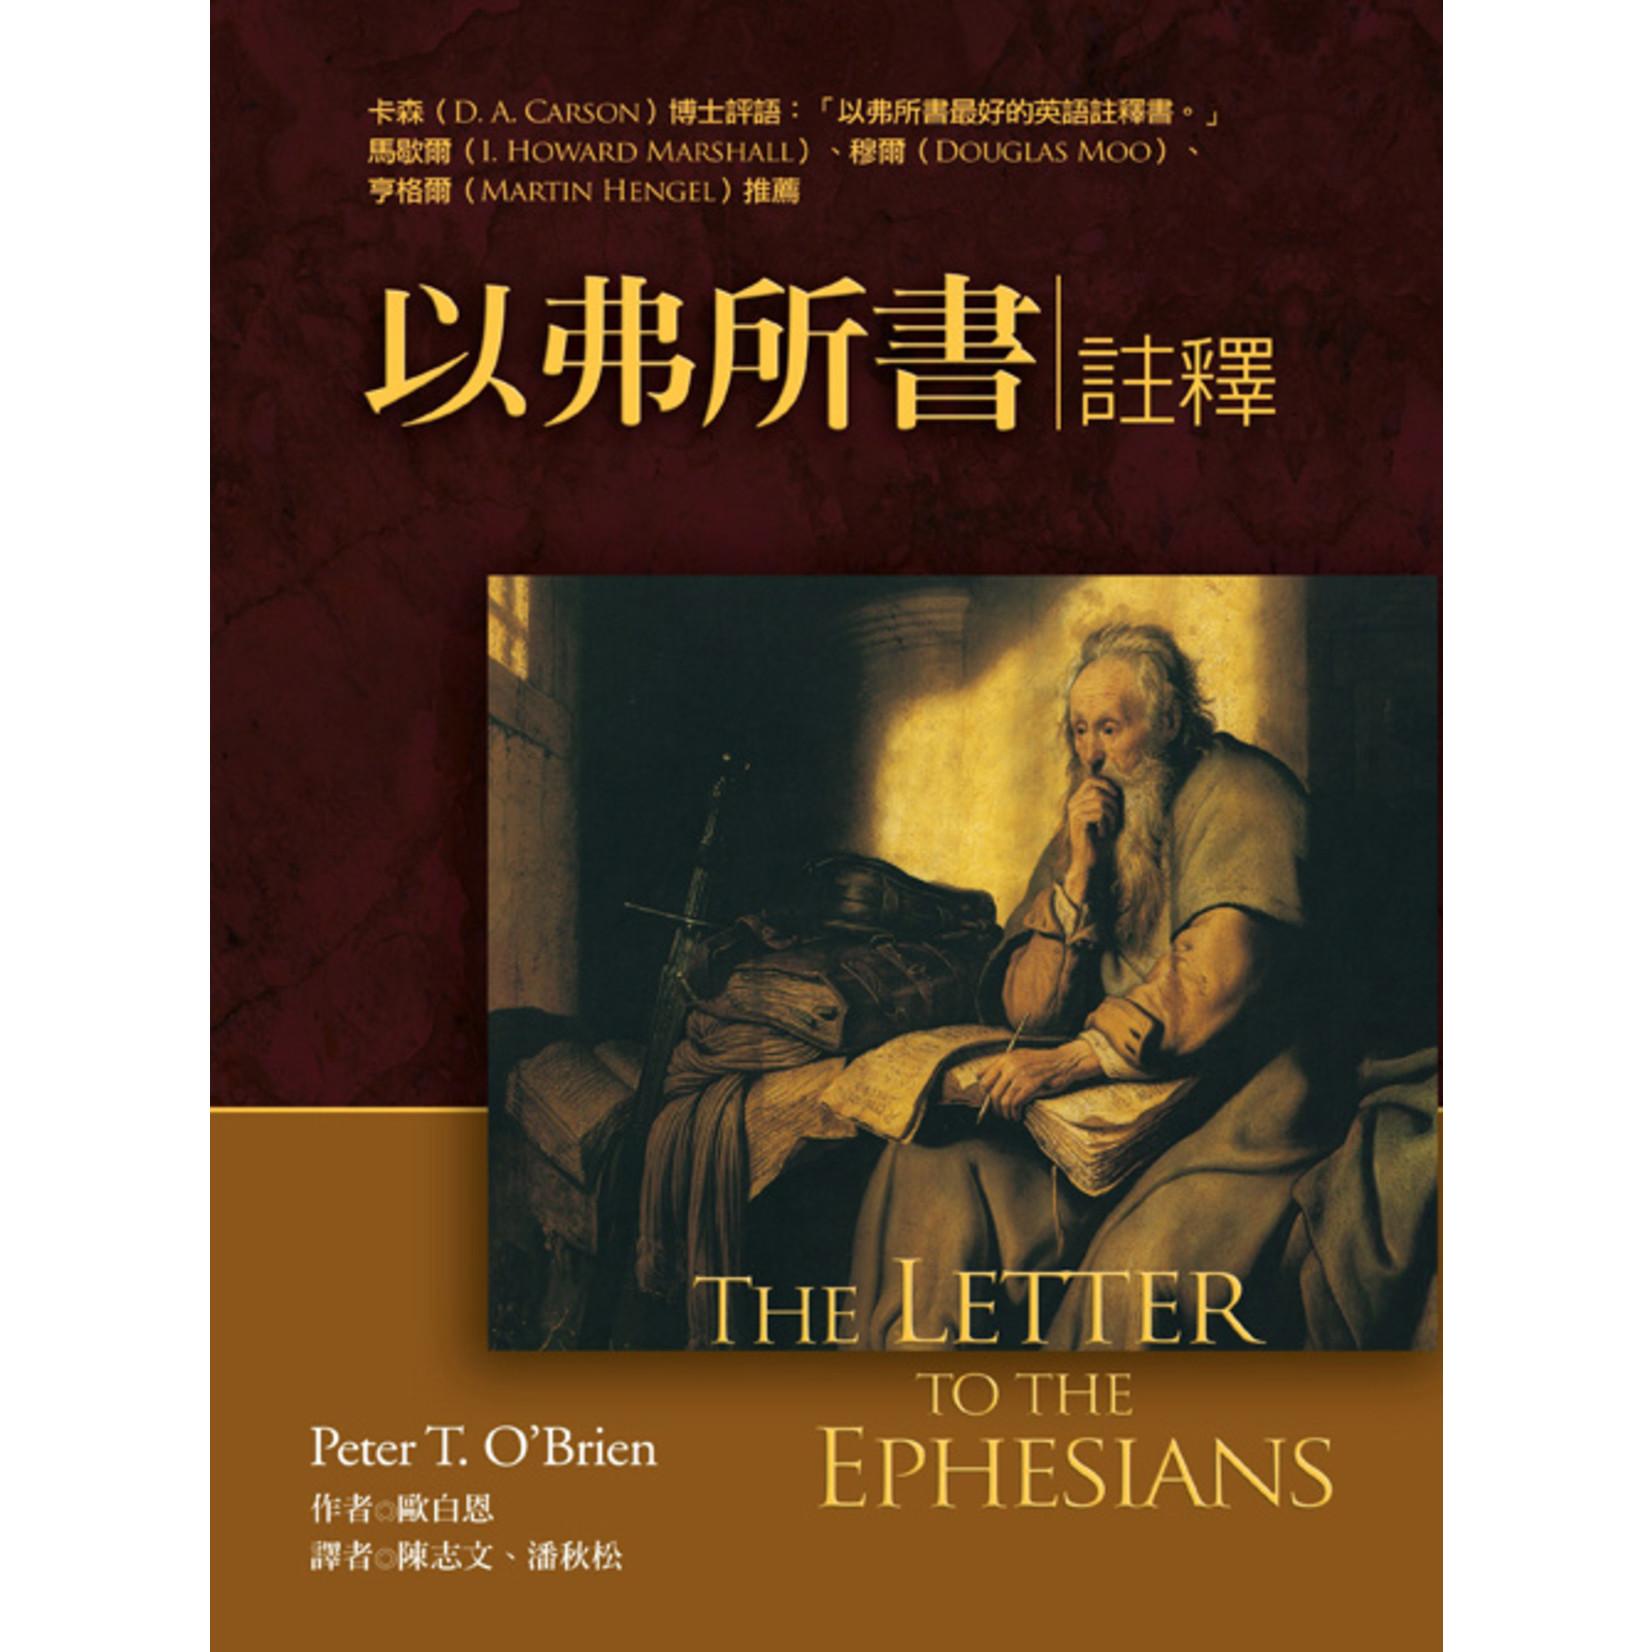 美國麥種傳道會 AKOWCM 以弗所書註釋  The Letter to the Ephesians